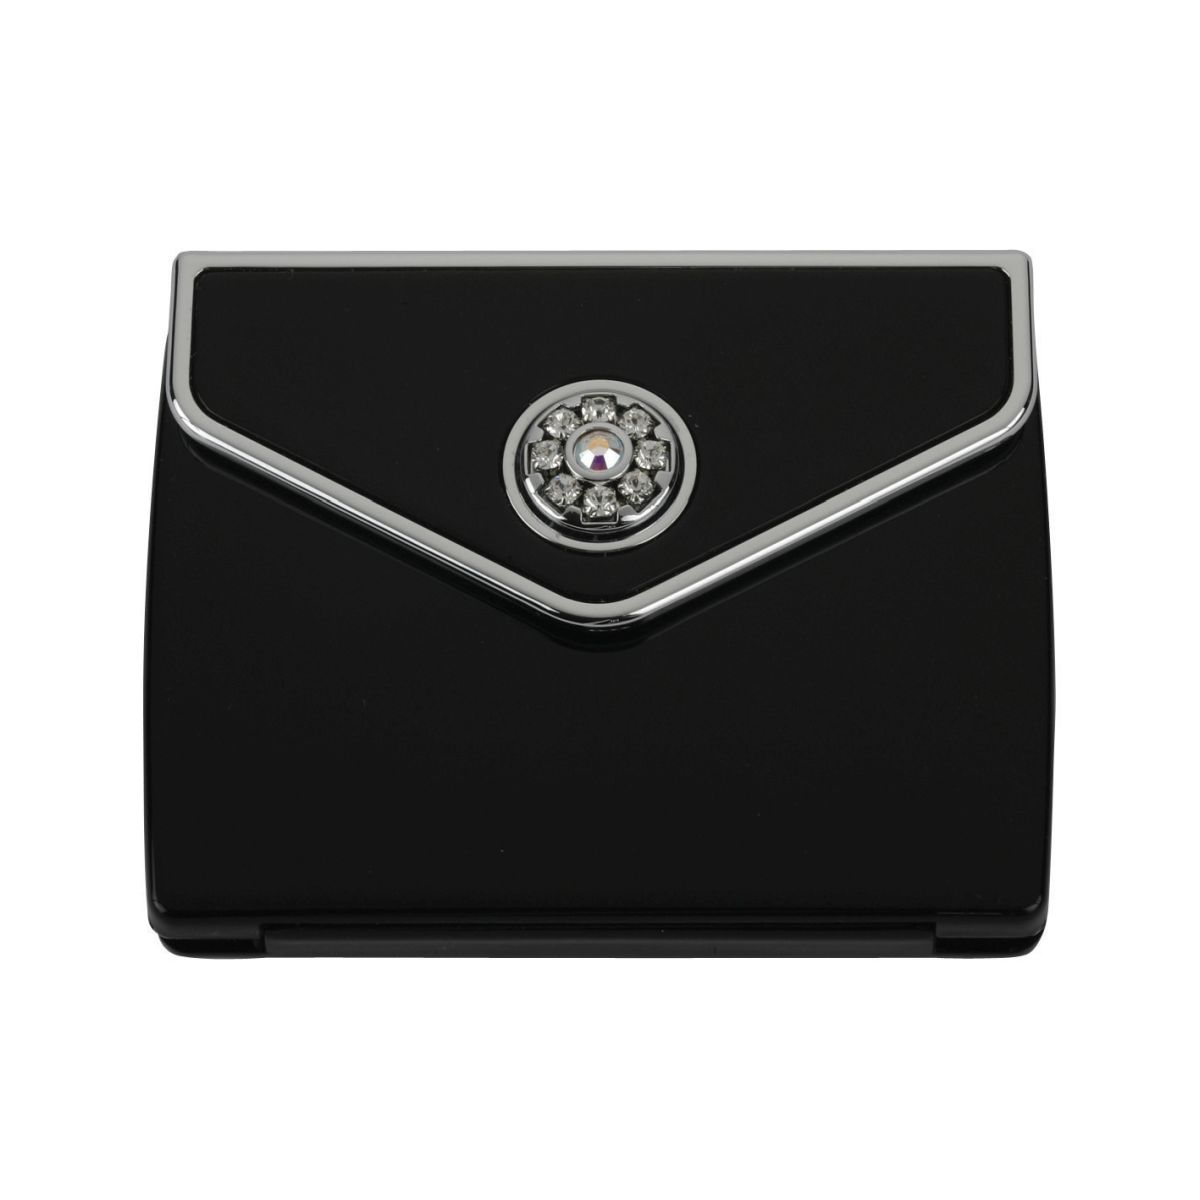 MC 336 blk - Tri Fold Envelope 5x Mirror Compact with Swarovski Crystal Elements - MC336SBLK